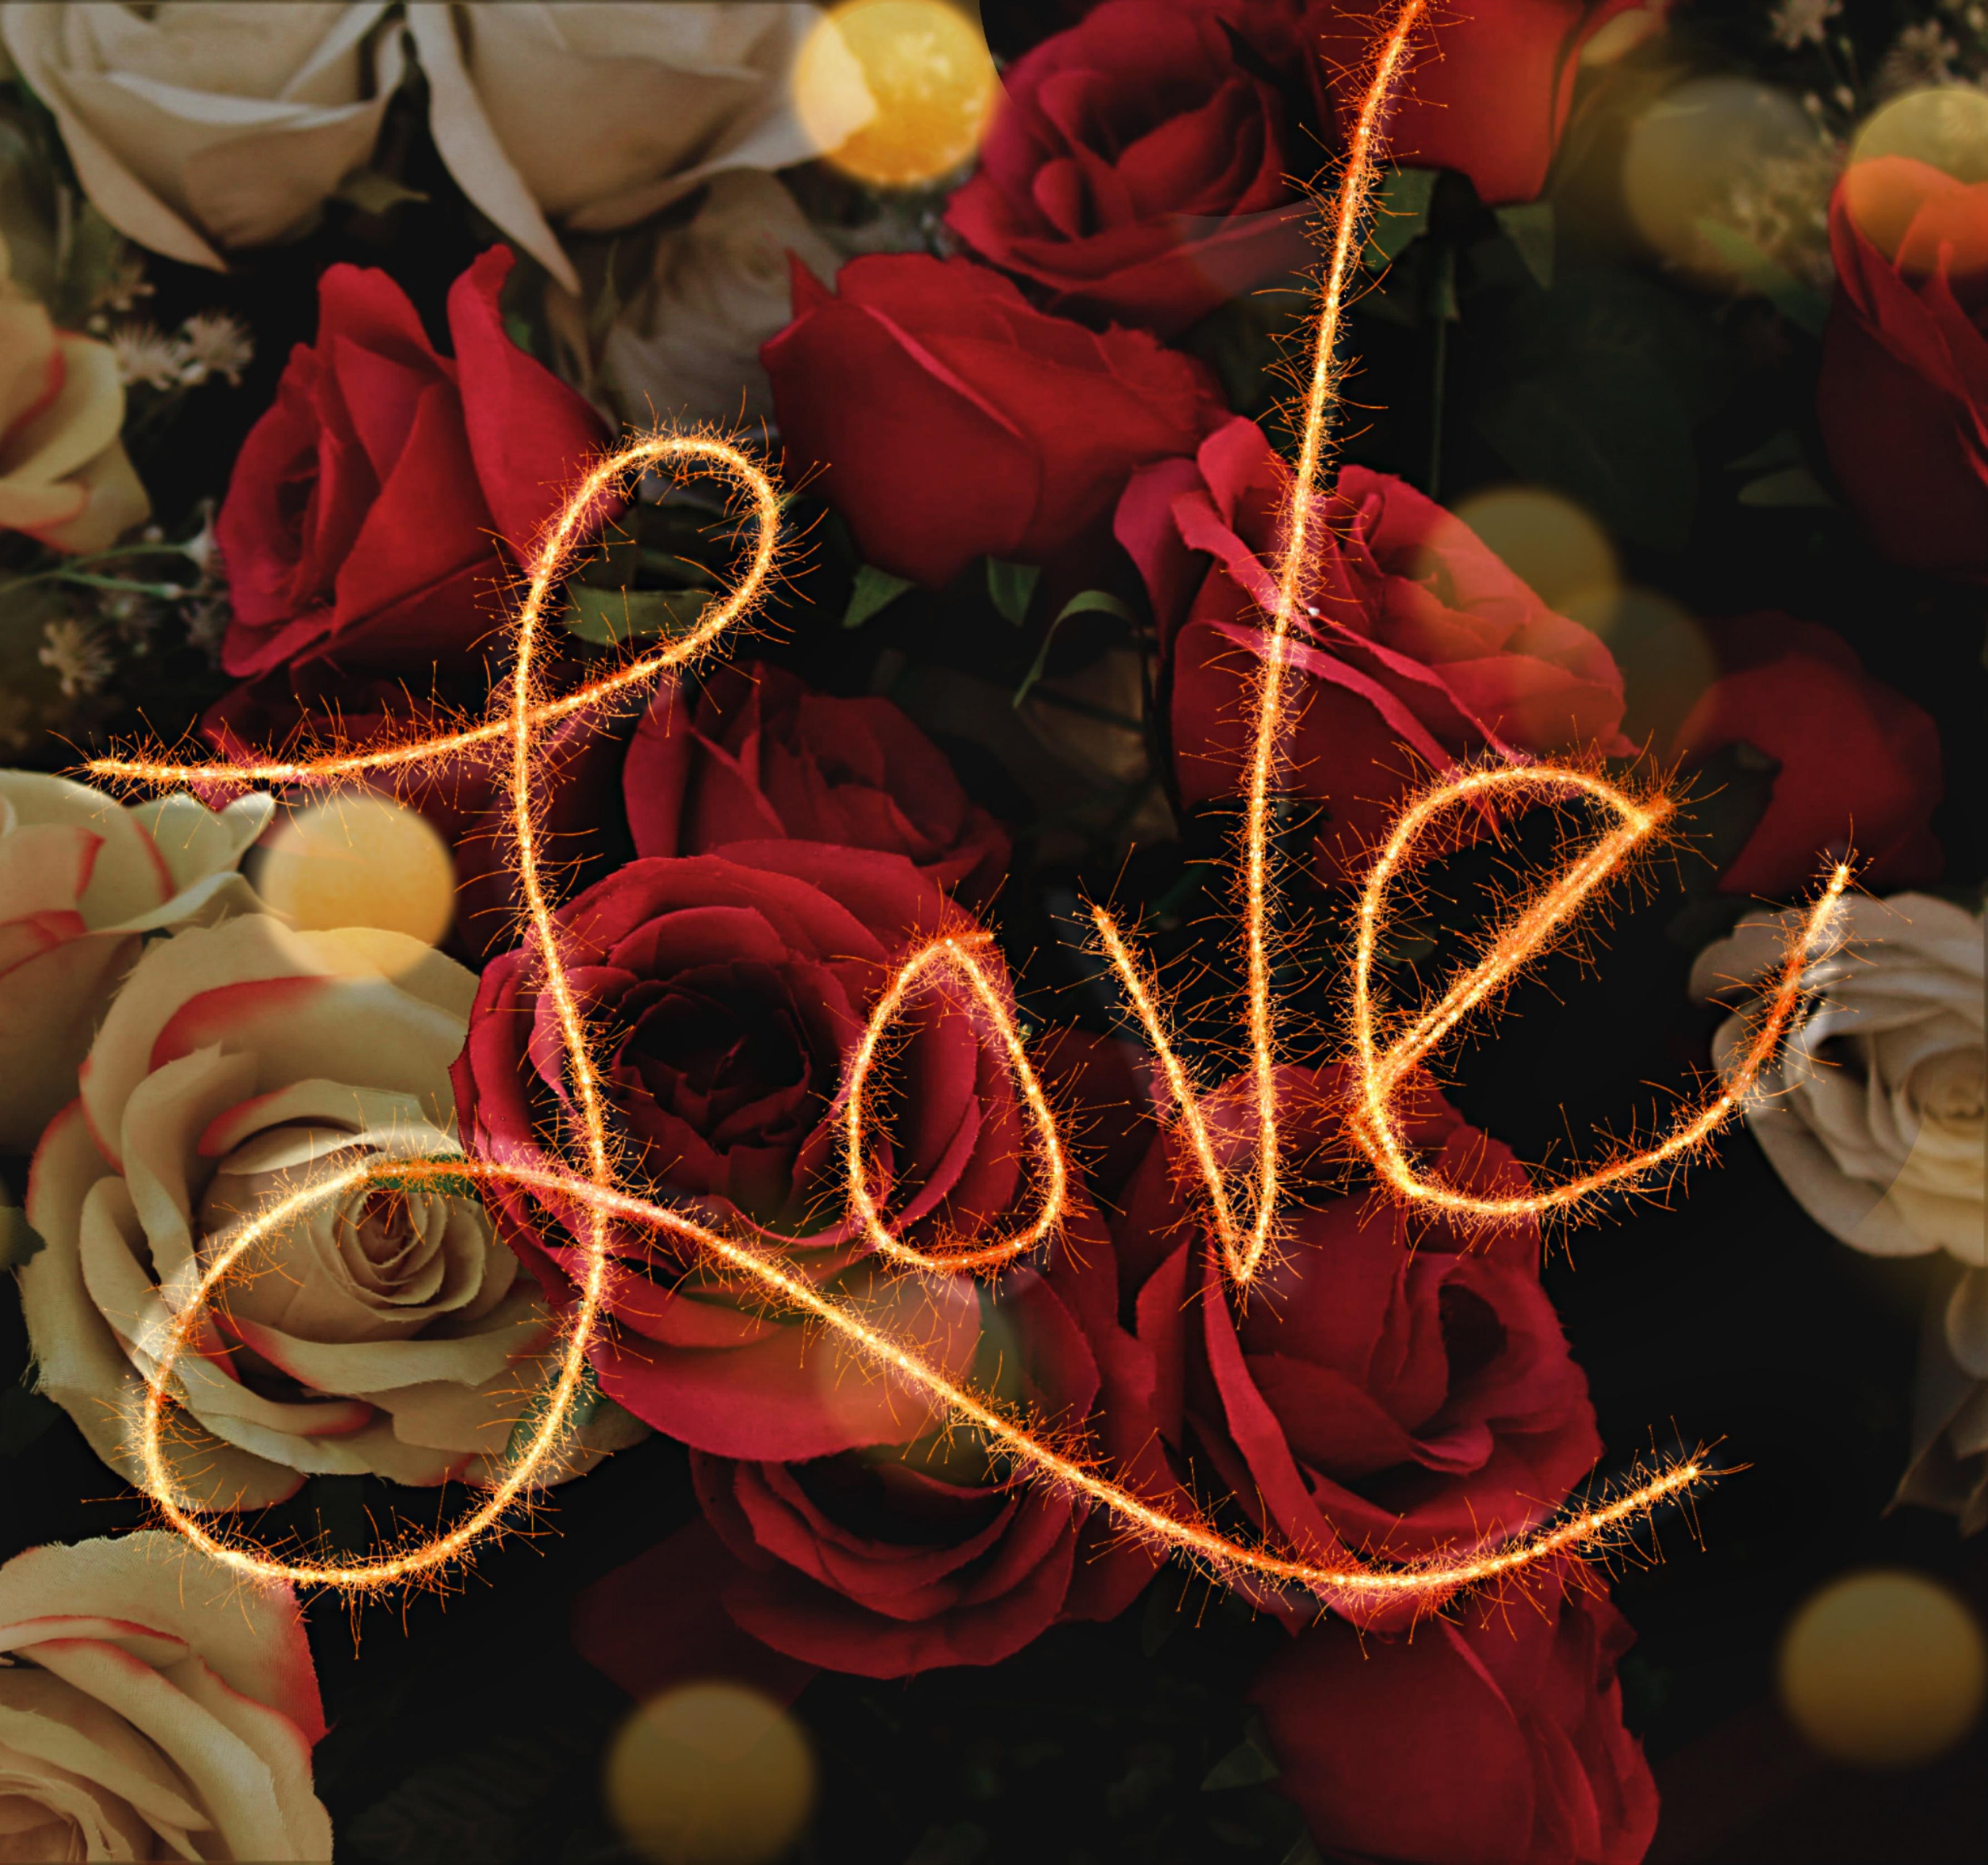 #love #valentine #valentinesday #sparks #flowers #flowersforlove #februaryvibes #freetoedit